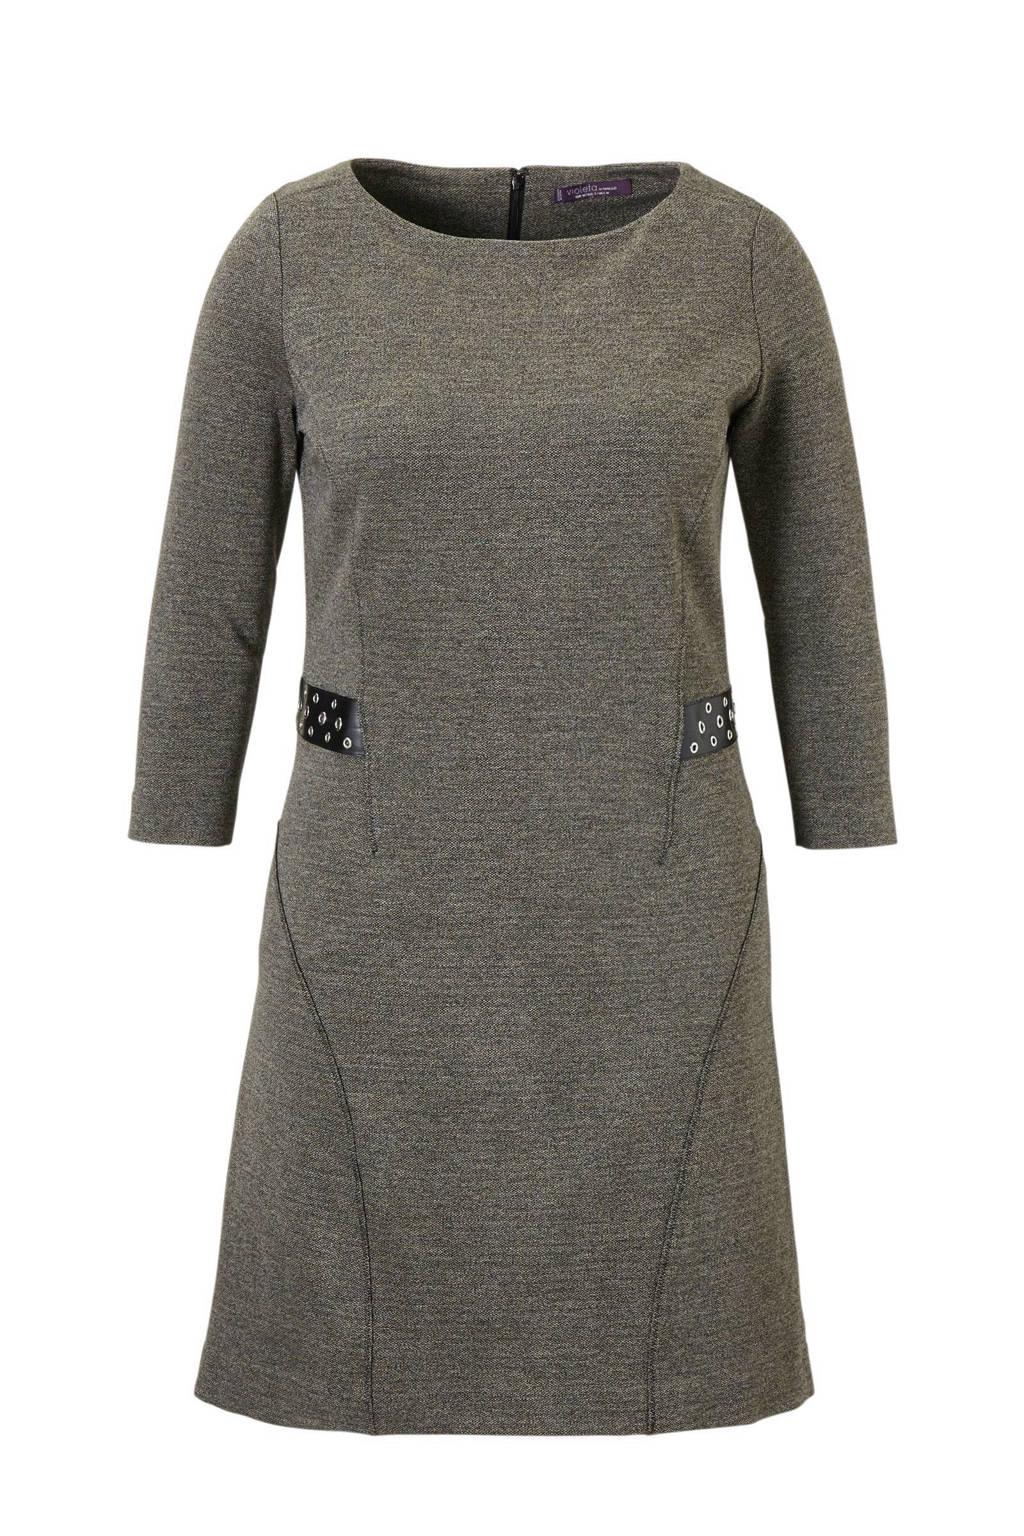 Violeta by Mango jurk, Donkergrijs